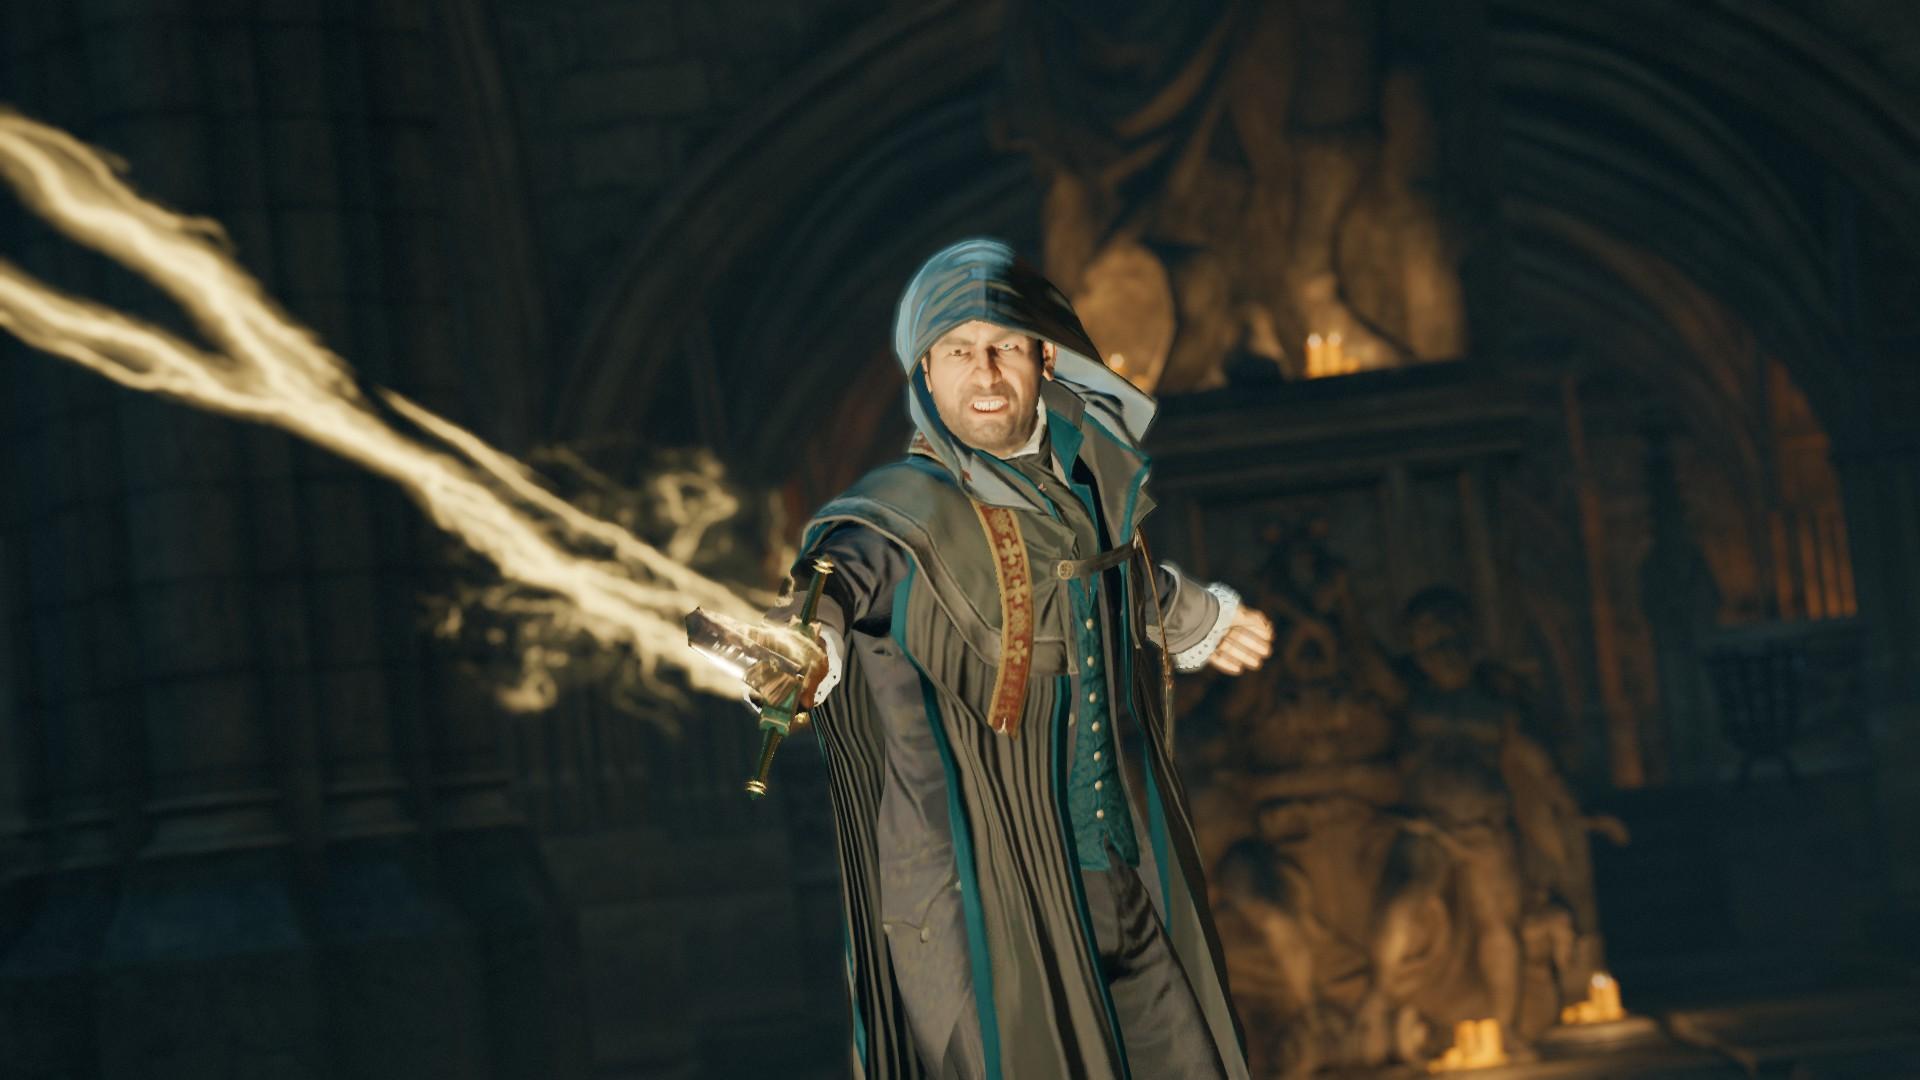 François-Thomas Germain   Assassin's Creed Wiki   Fandom